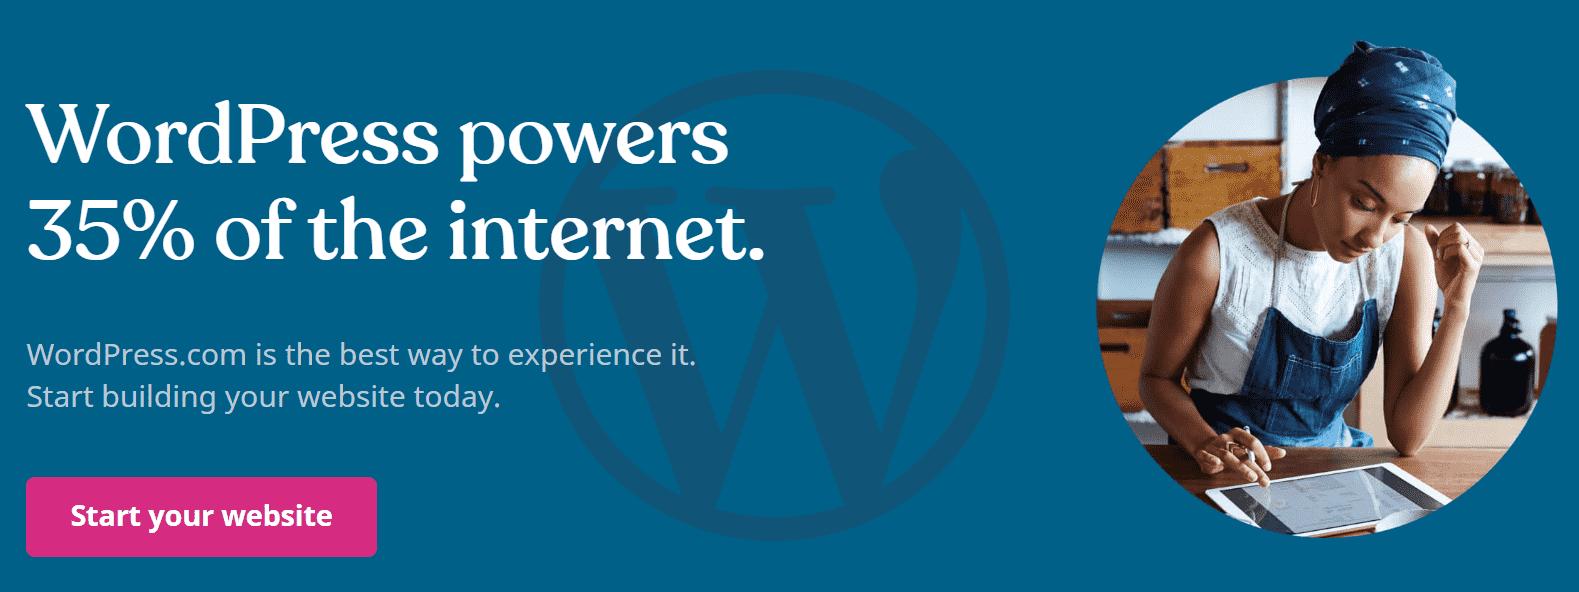 wp.com about